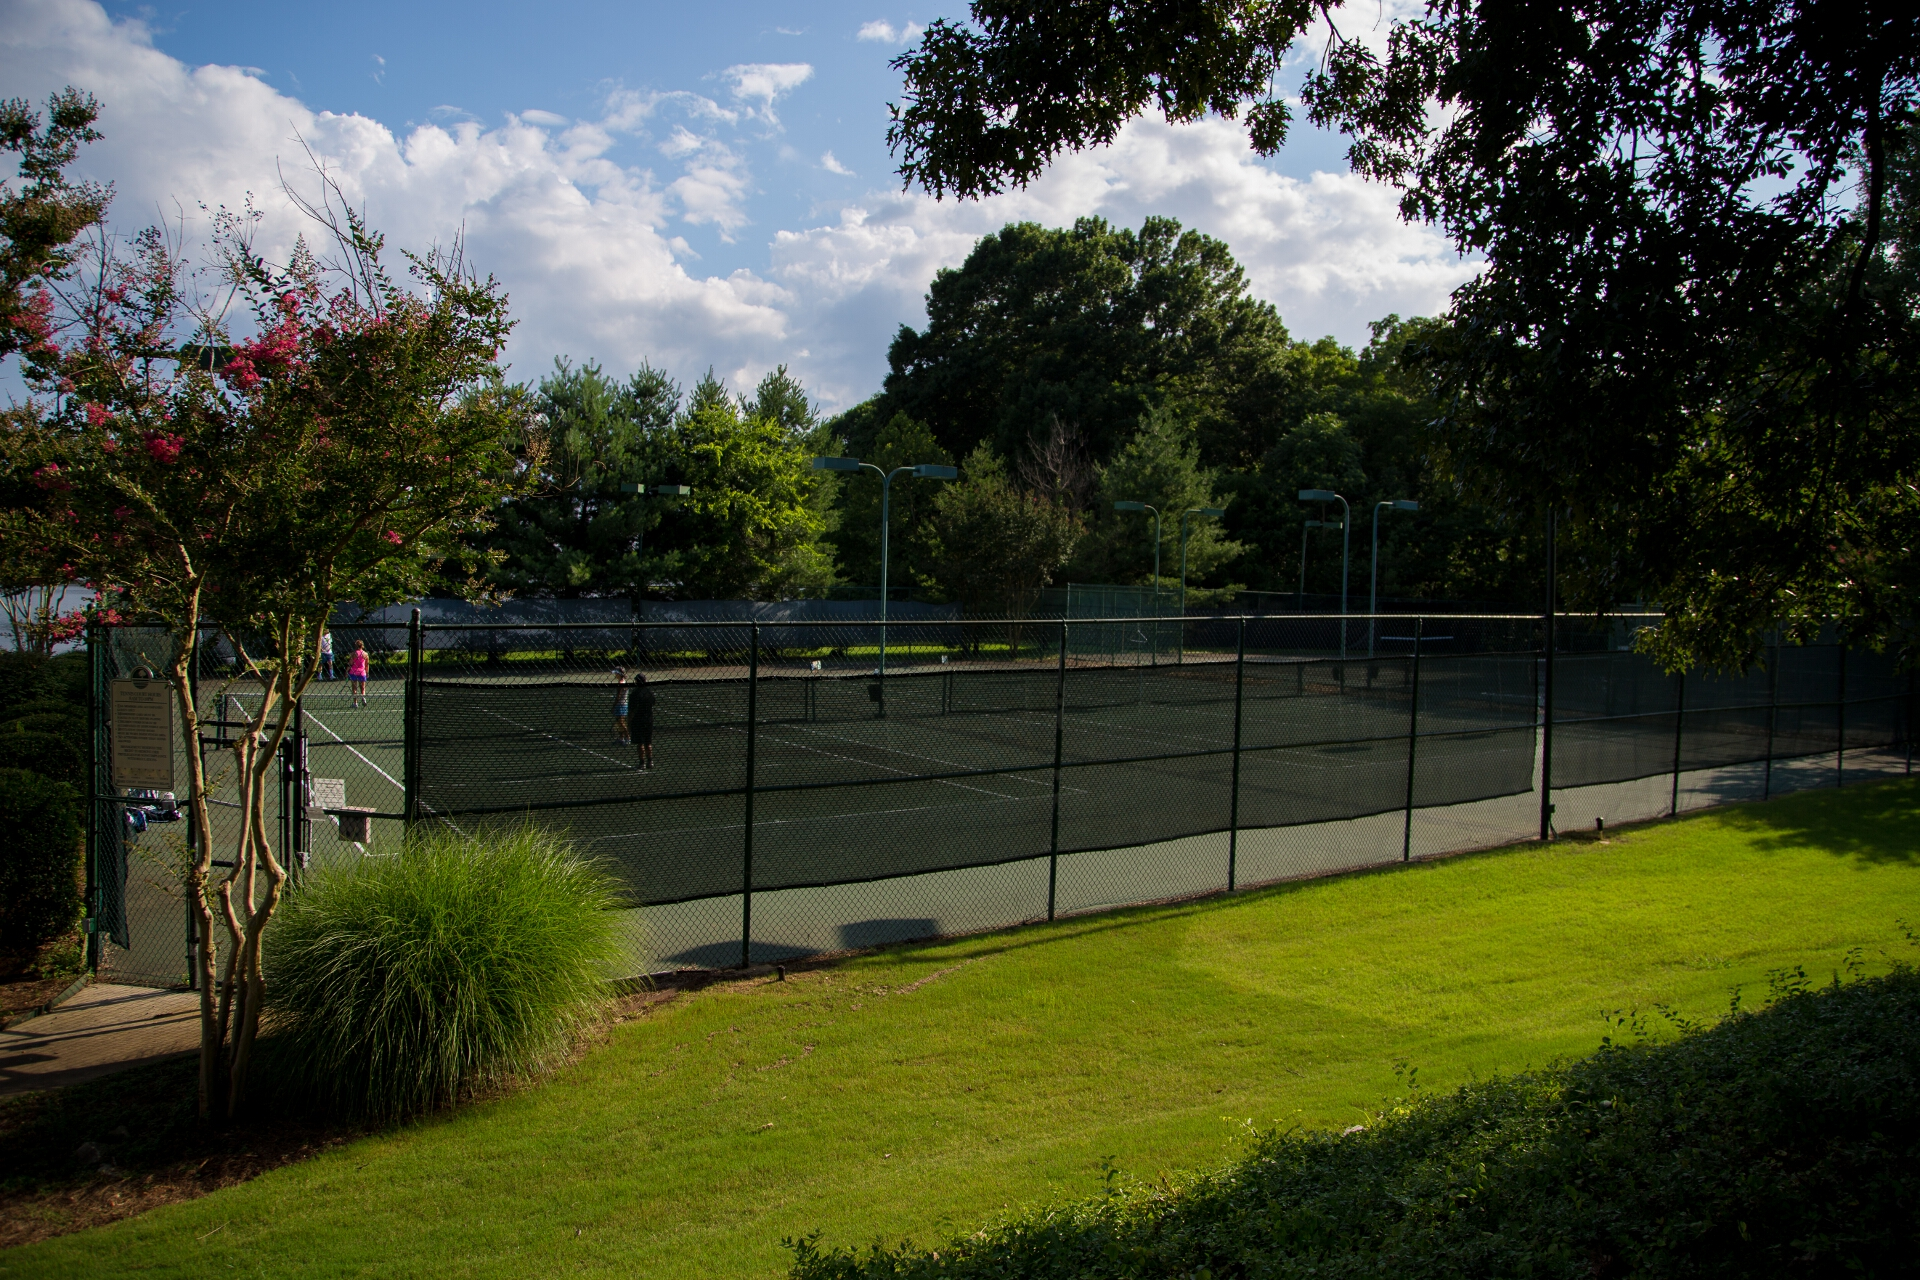 edgewater tennis courts